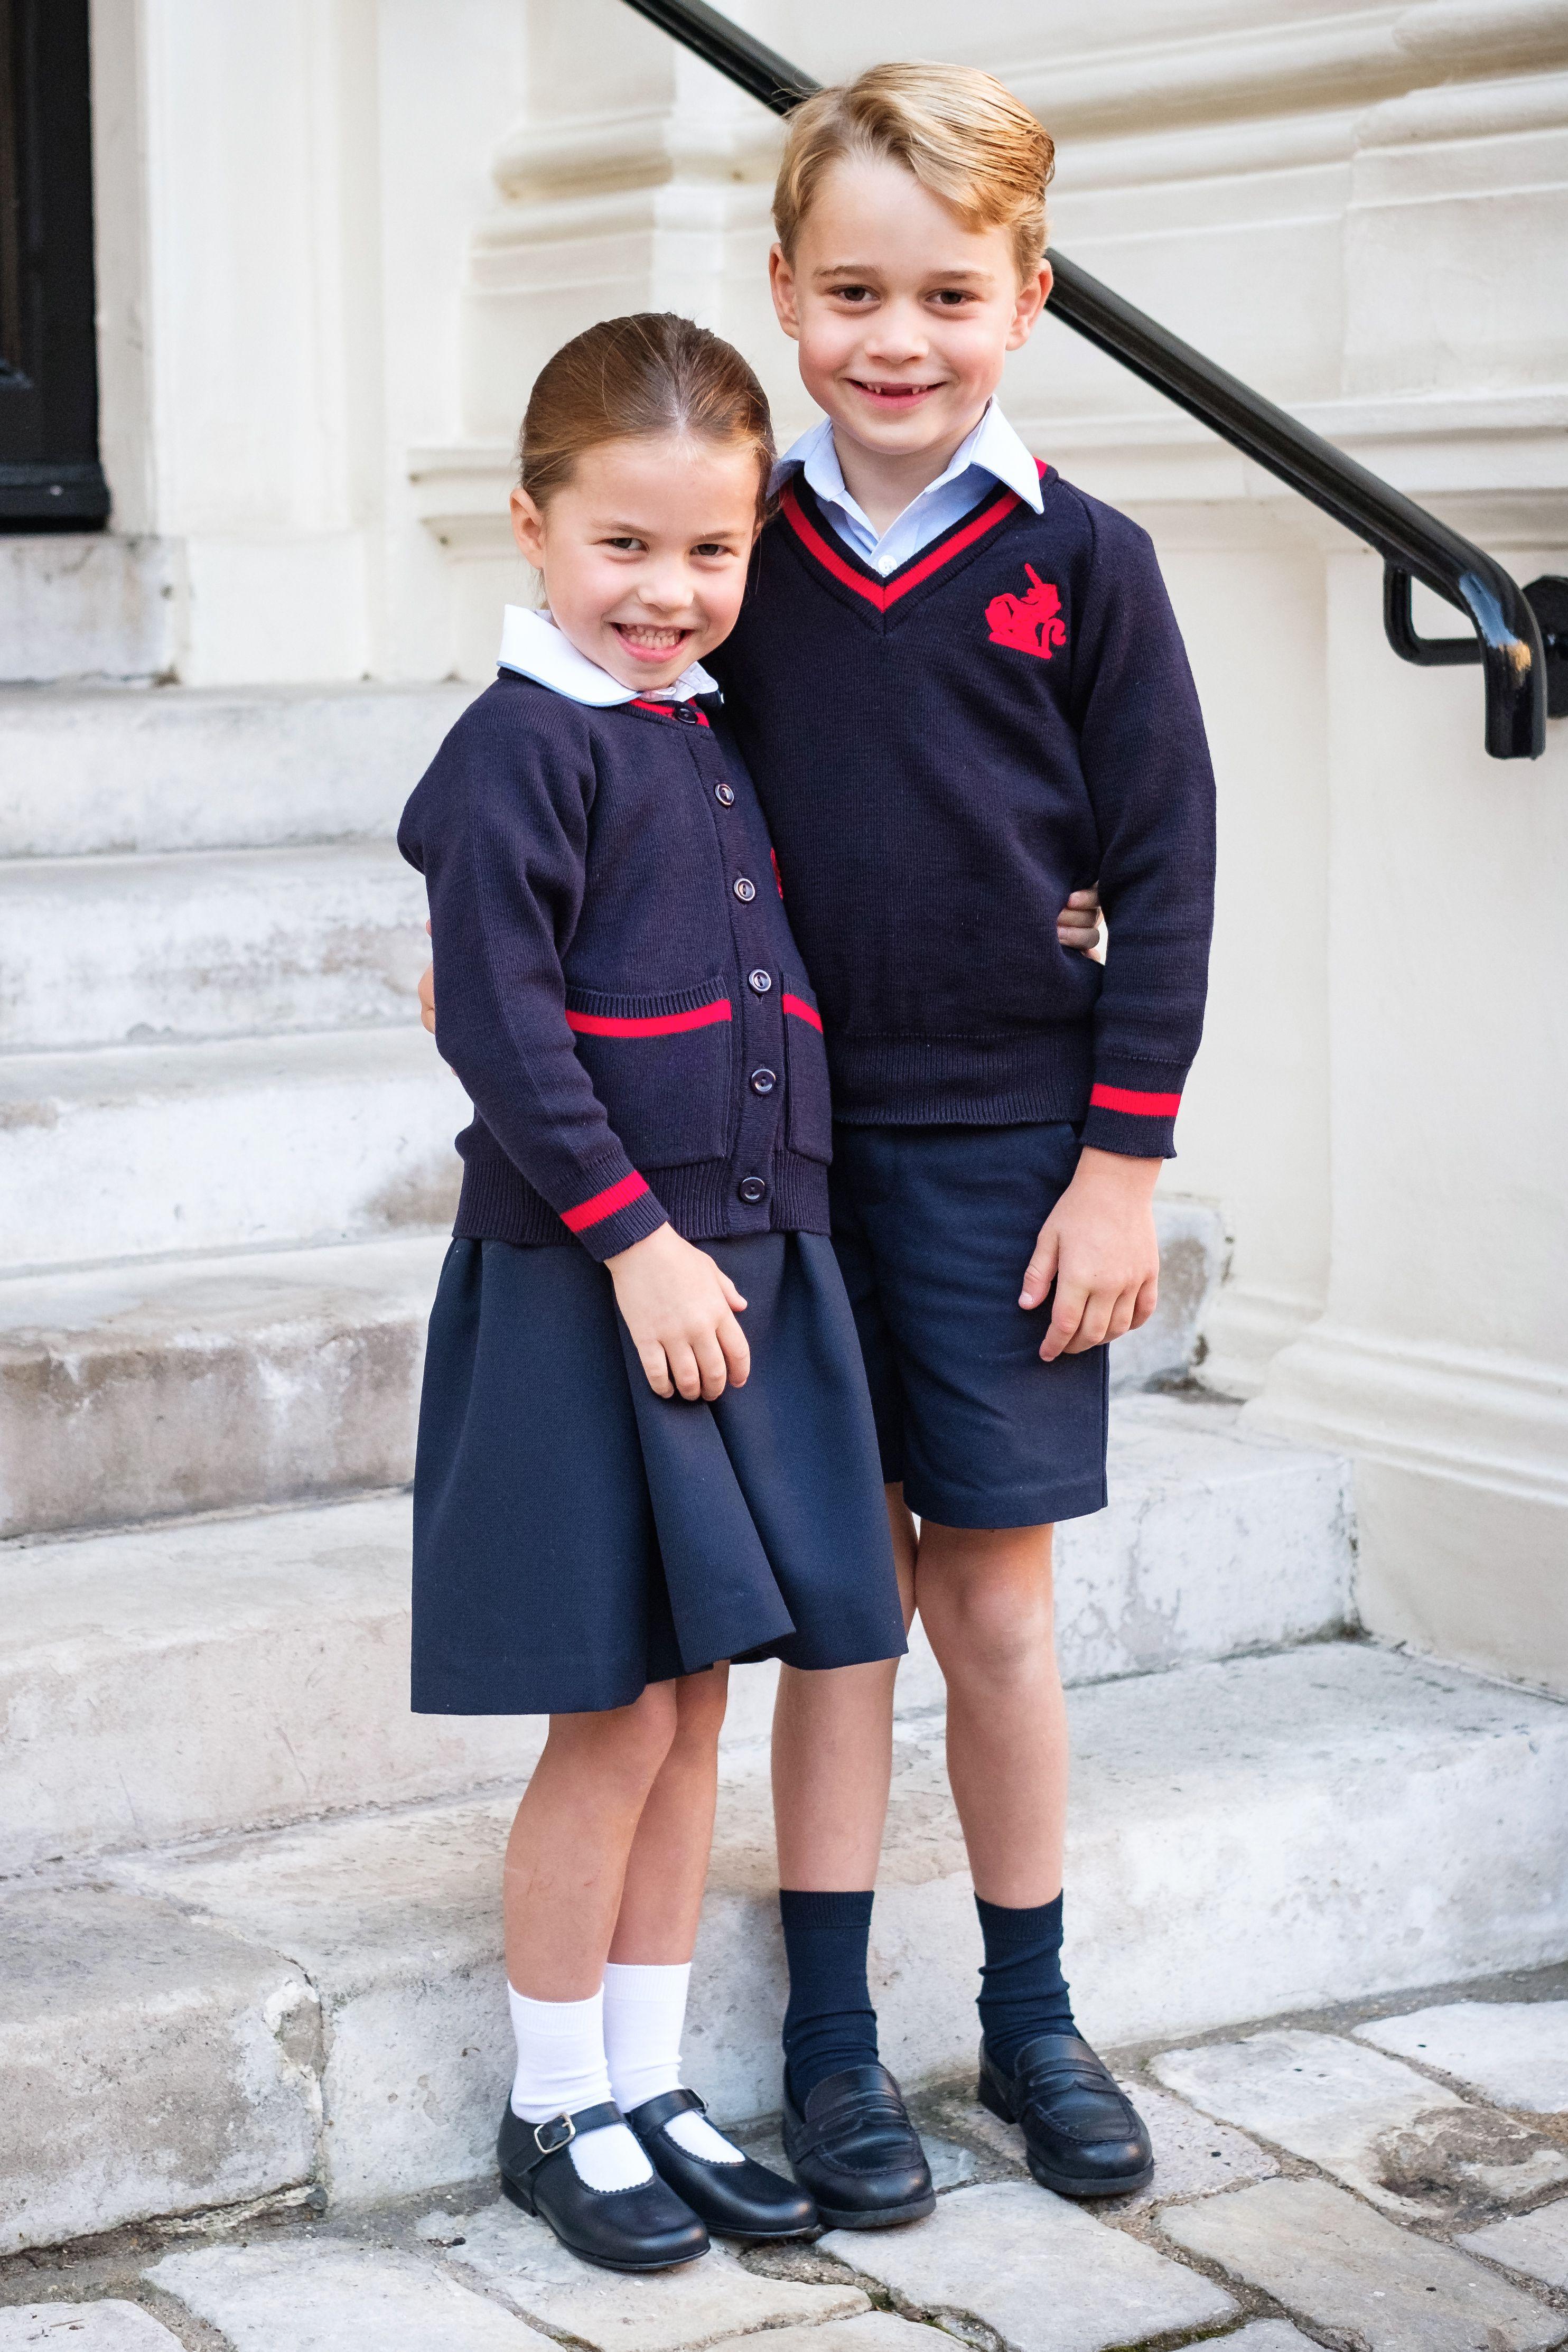 Prince George and Princess Charlotte Will Be Homeschooled Amid Coronavirus Pandemic